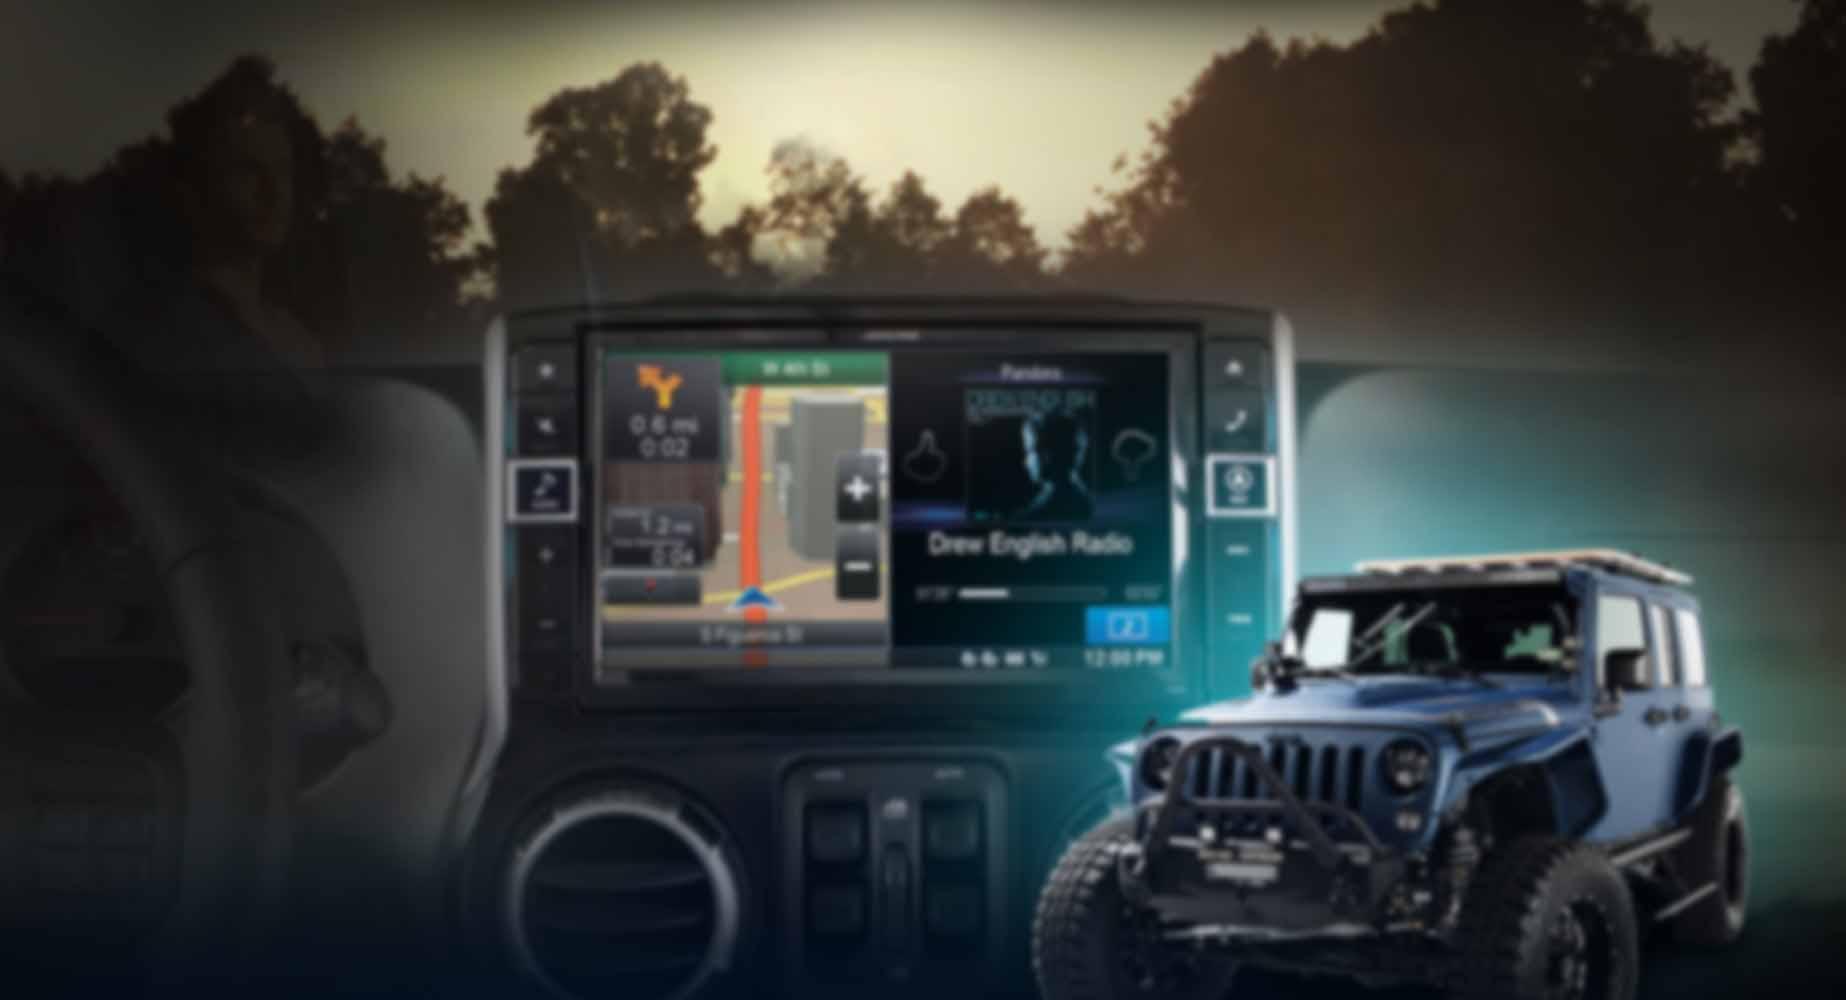 viper 5305v car alarm wiring diagram ge refrigerator access 1 & audio cleveland's premier mobile electronics shop